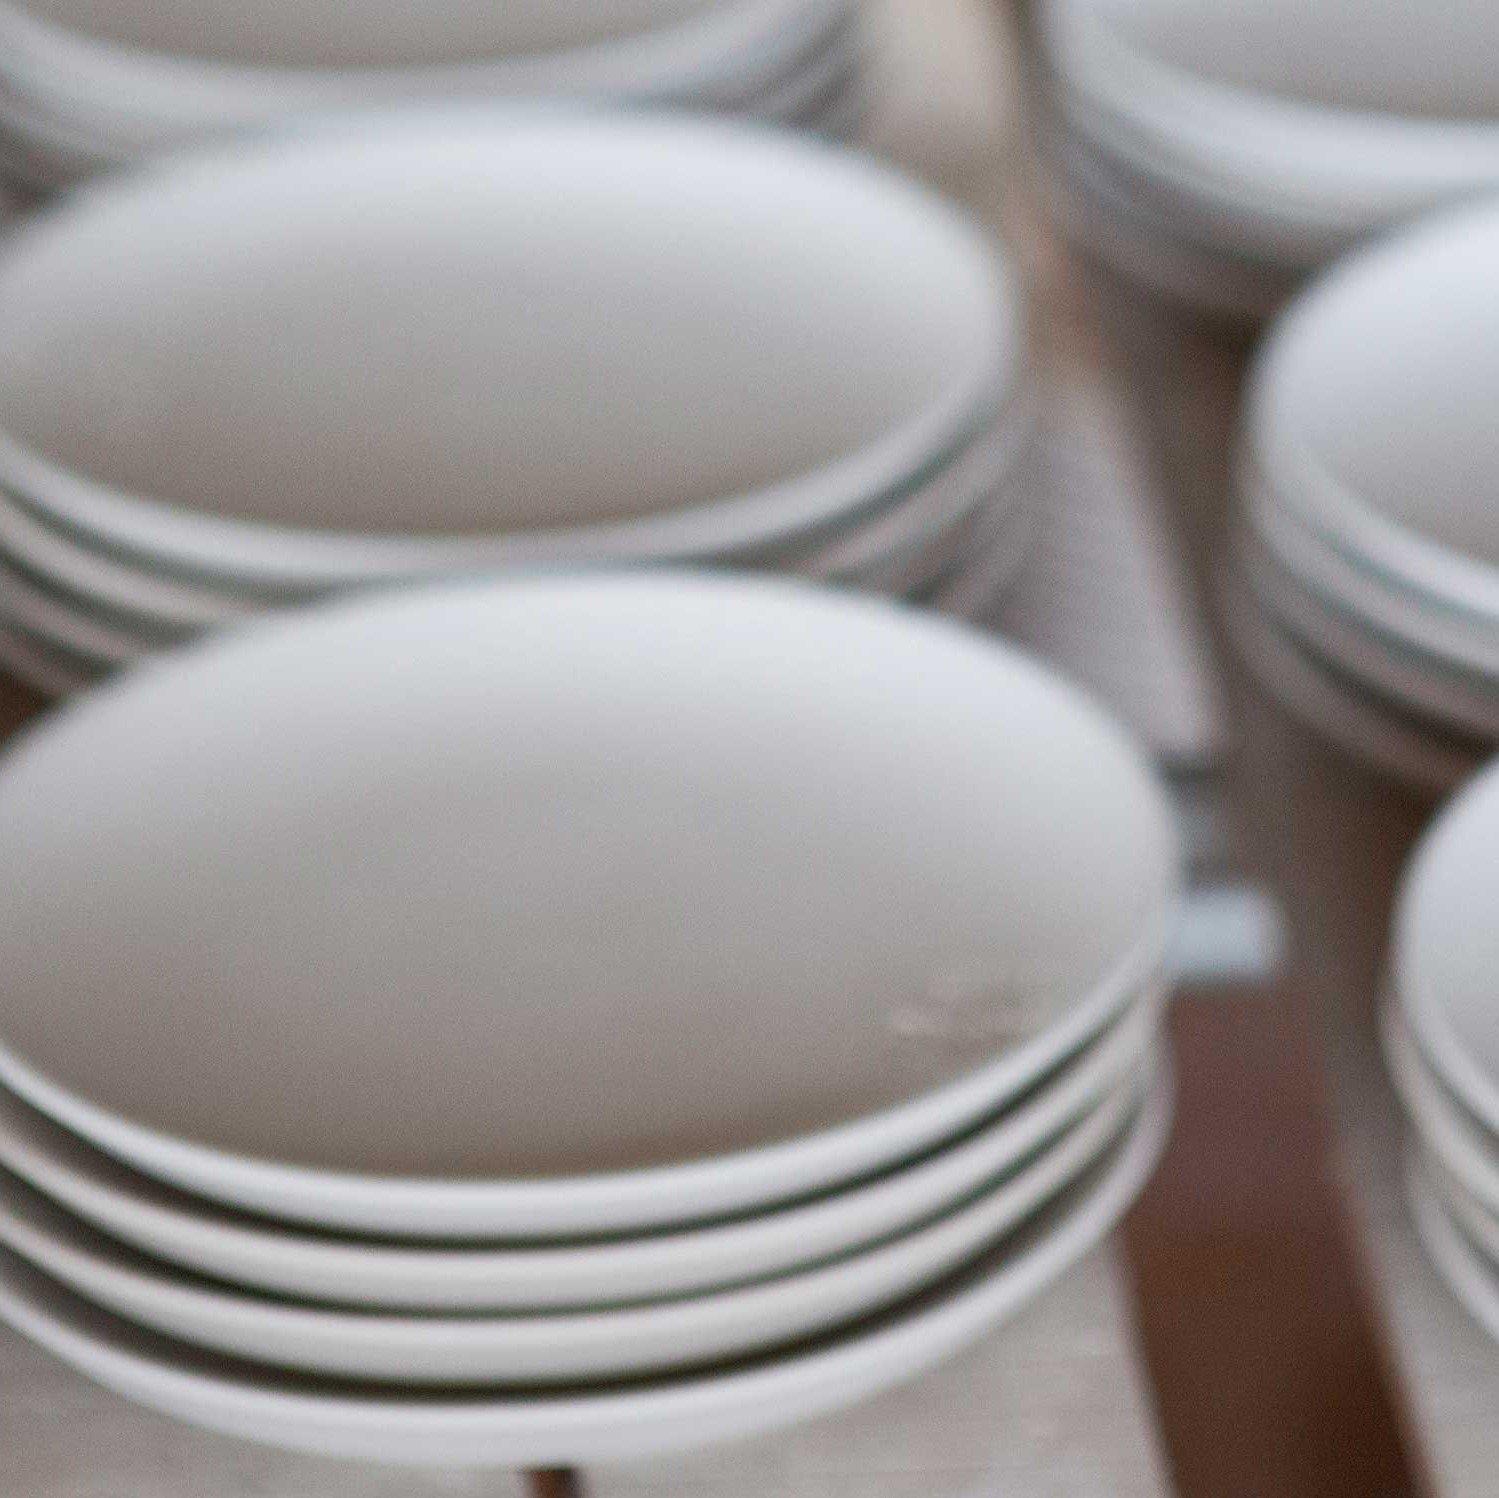 ceramic-plates-vietnam-oau-42116_AMIJOLC2.original.jpg